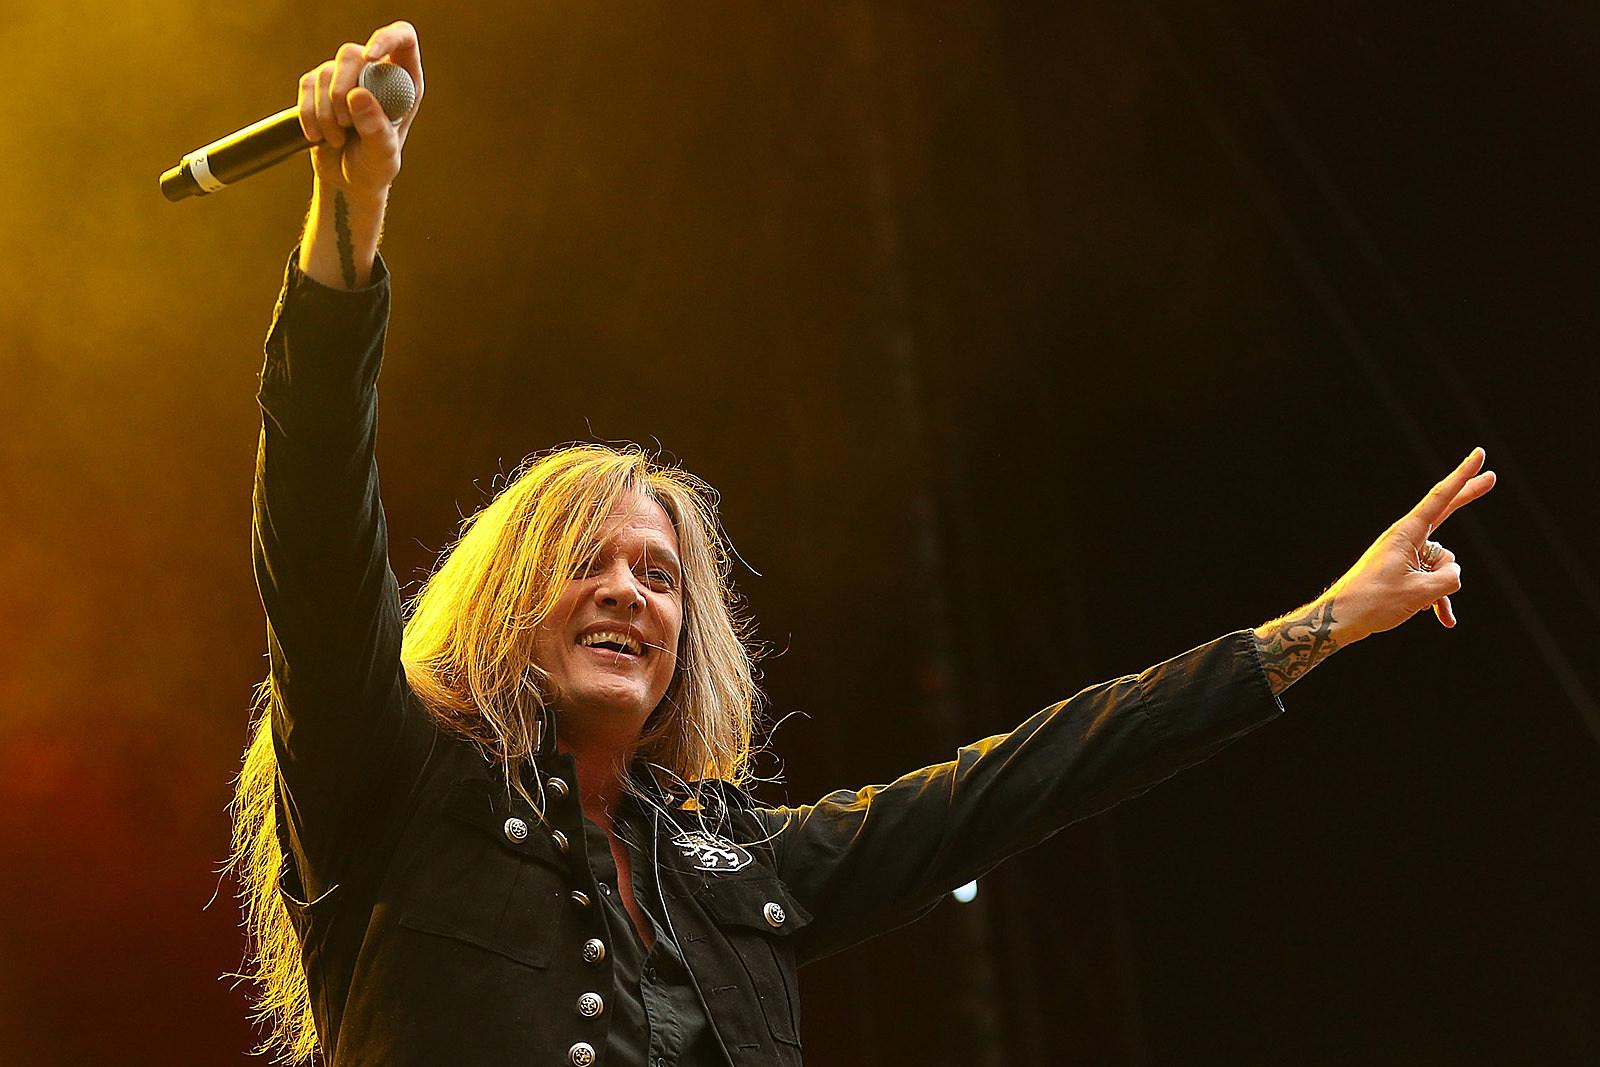 Sebastian Bach to Anti-Biden Rockers: 'F— You and Your Band'